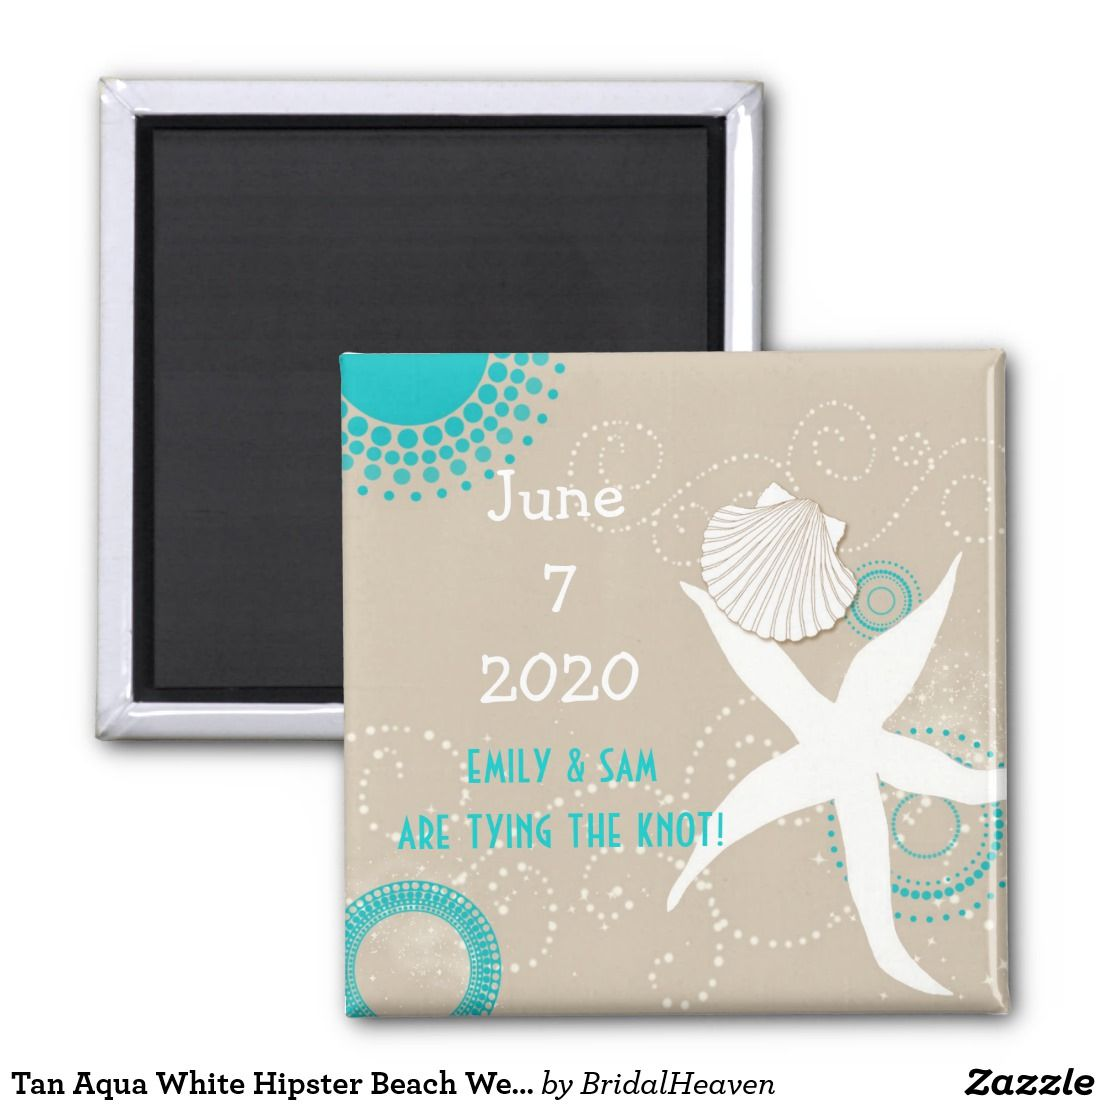 Teal beach wedding  Tan Aqua White Hipster Beach Wedding Save the Date Magnet Lovely